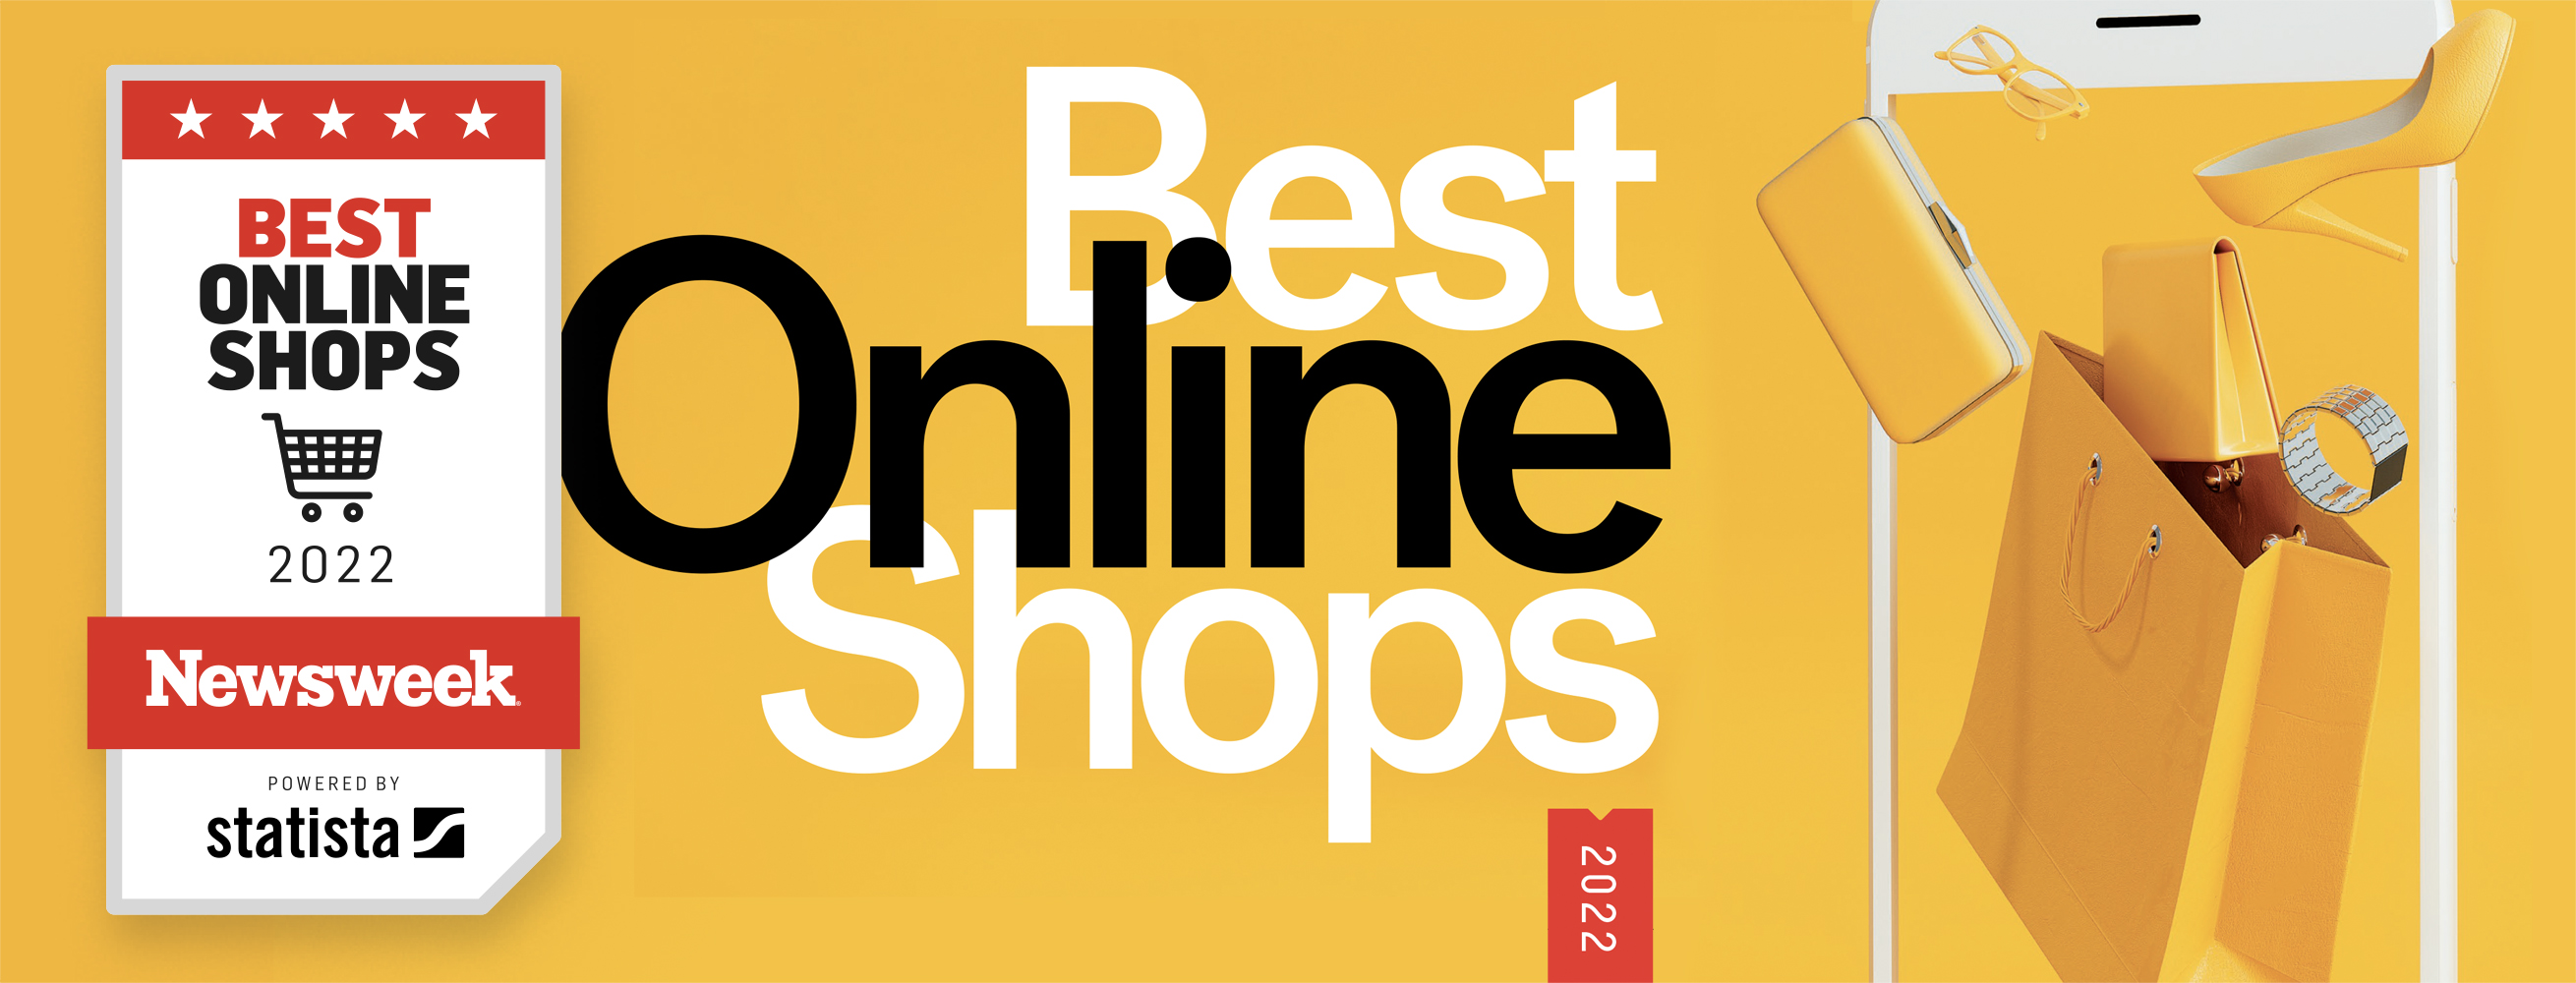 Best Online Shops 2022